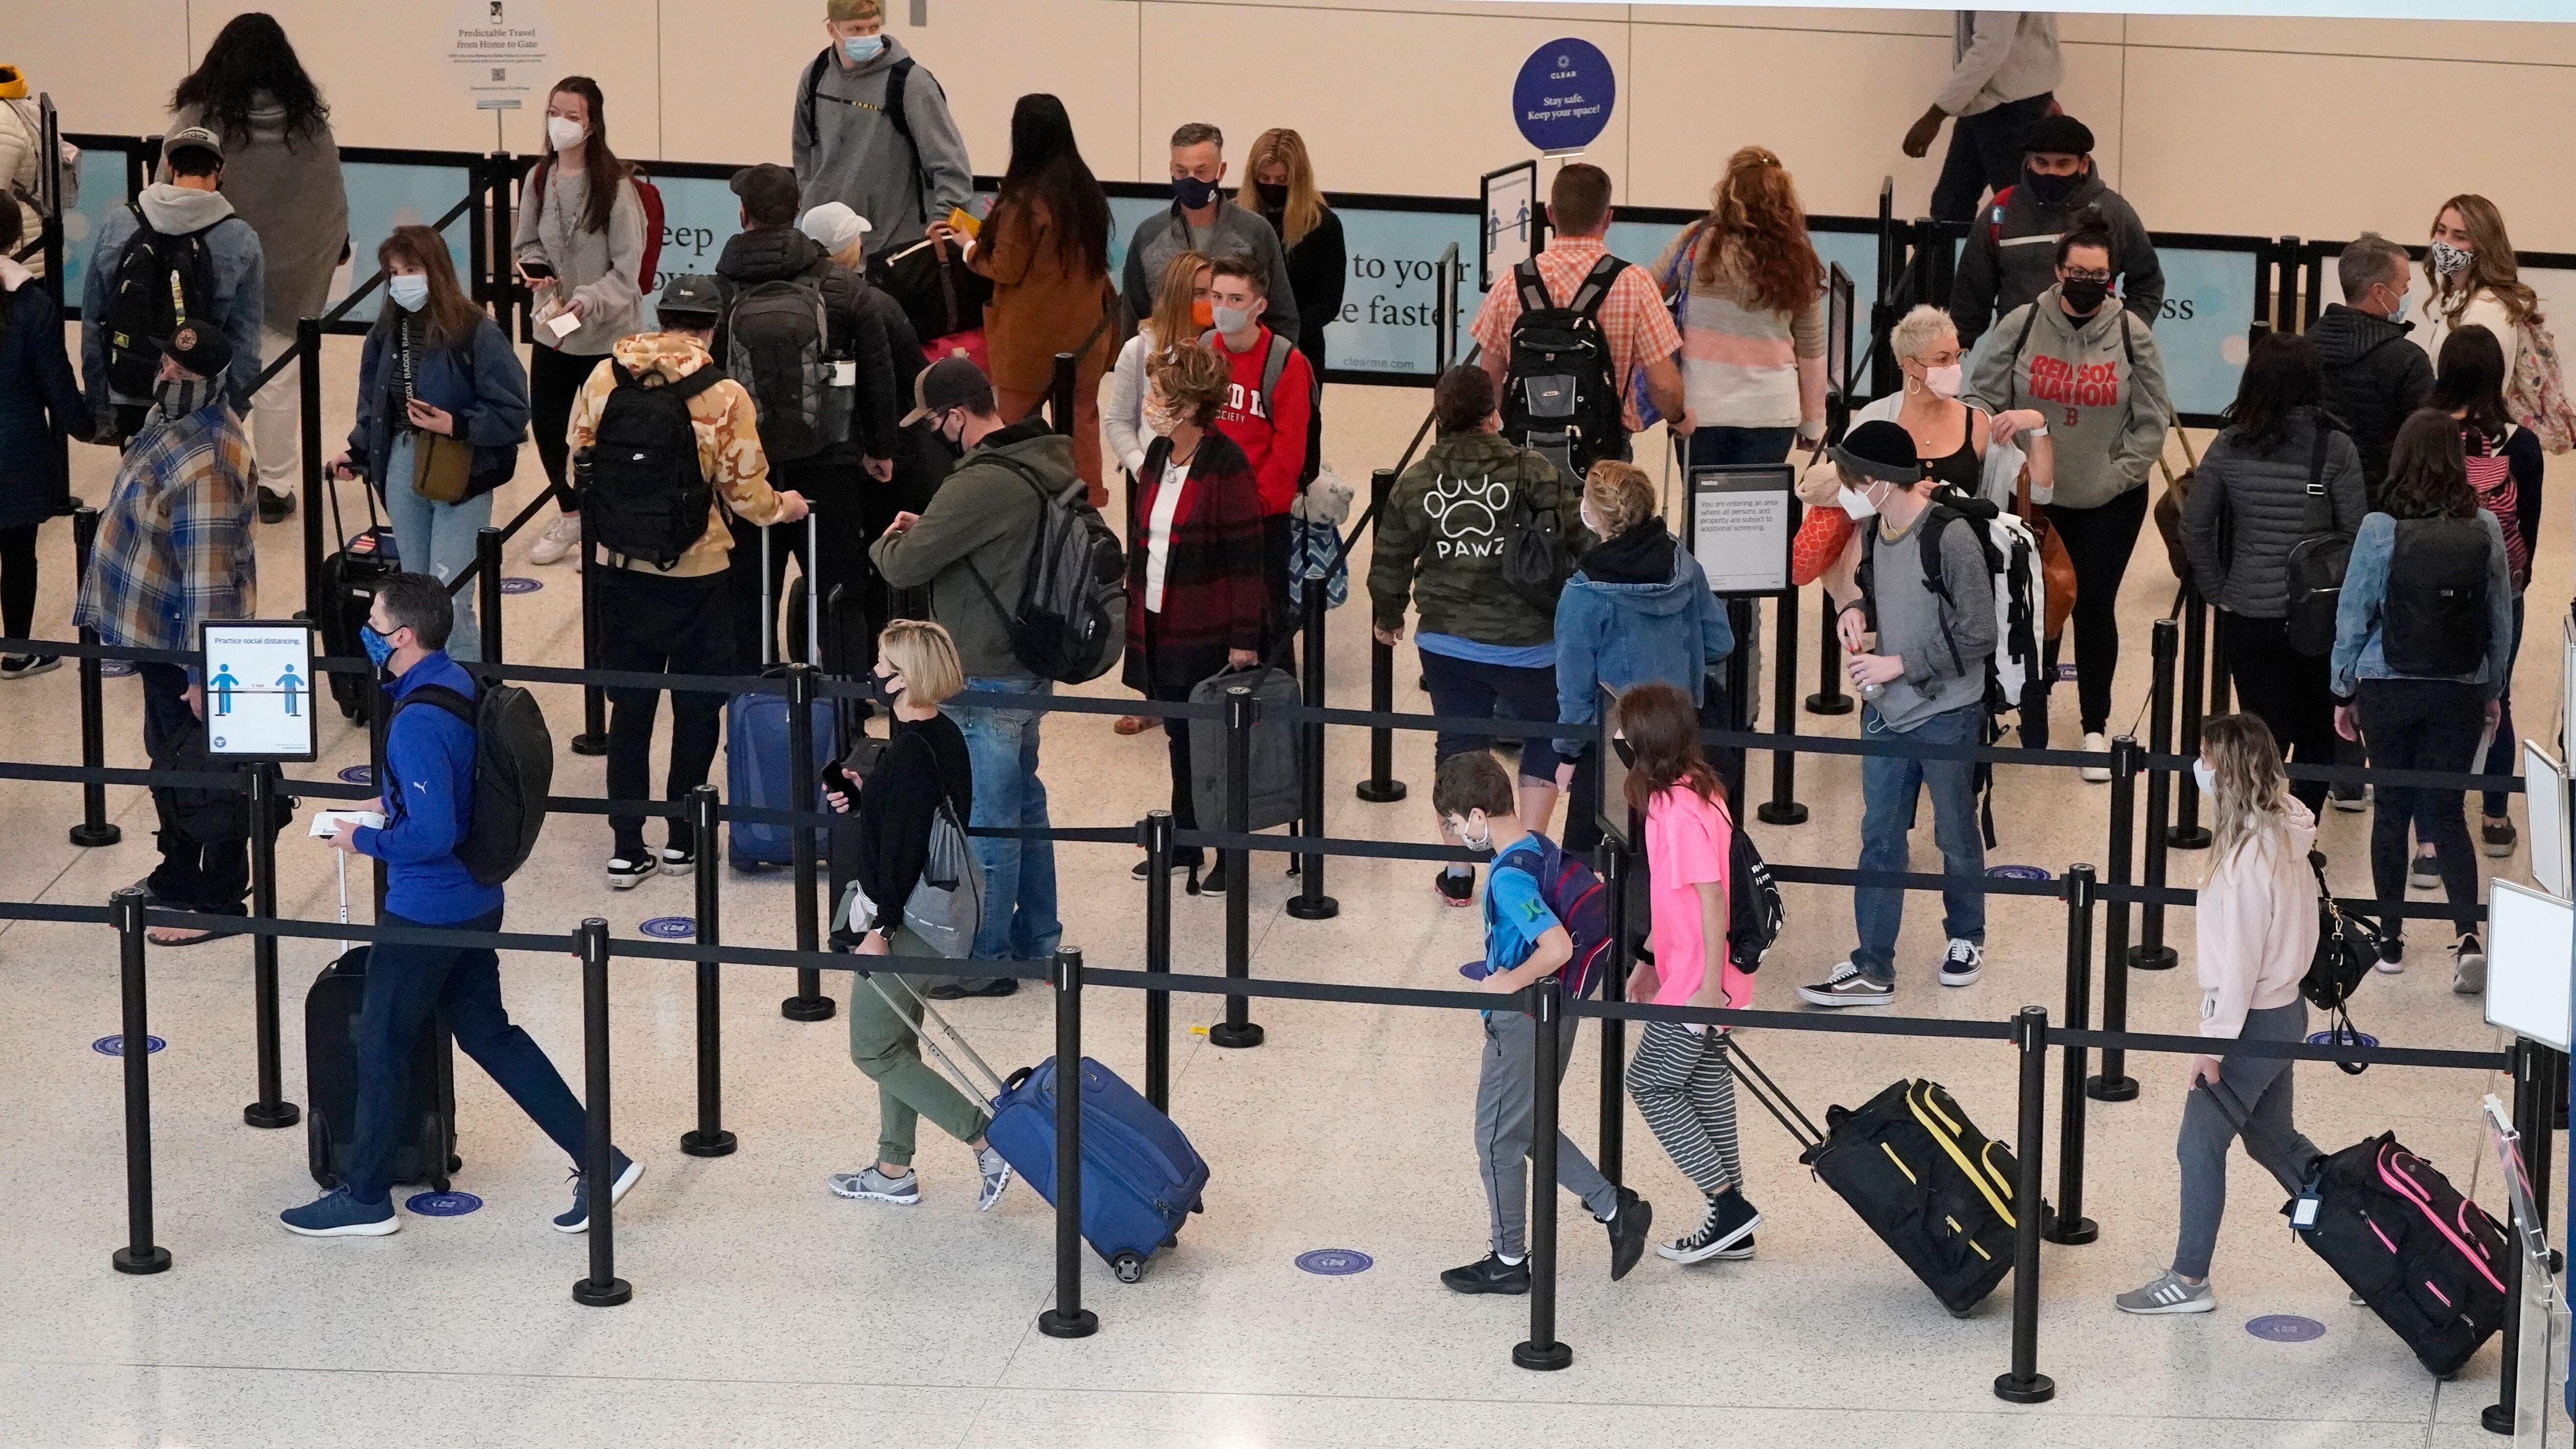 Air travelers line up to go through a security checkpoint at Salt Lake City International Airport Wednesday, Nov. 25, 2020, i